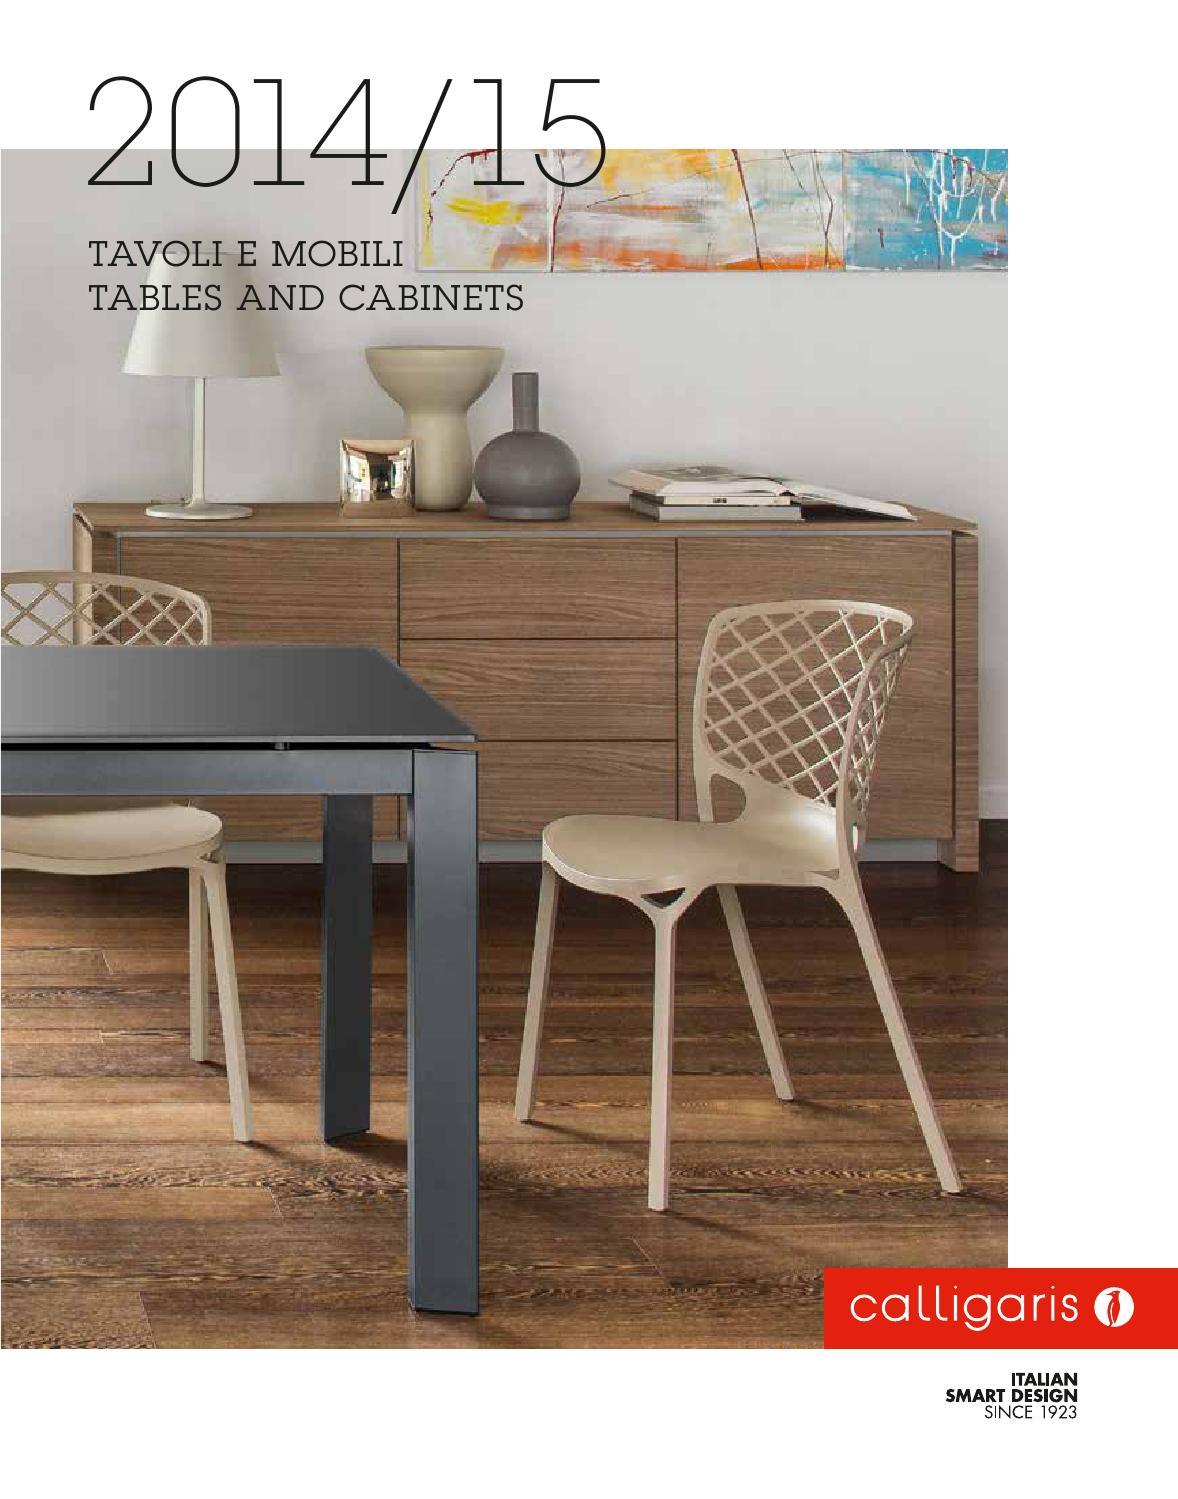 calligaris catalogo 2014 freemarket tavoli mobili by bassini arredi issuu